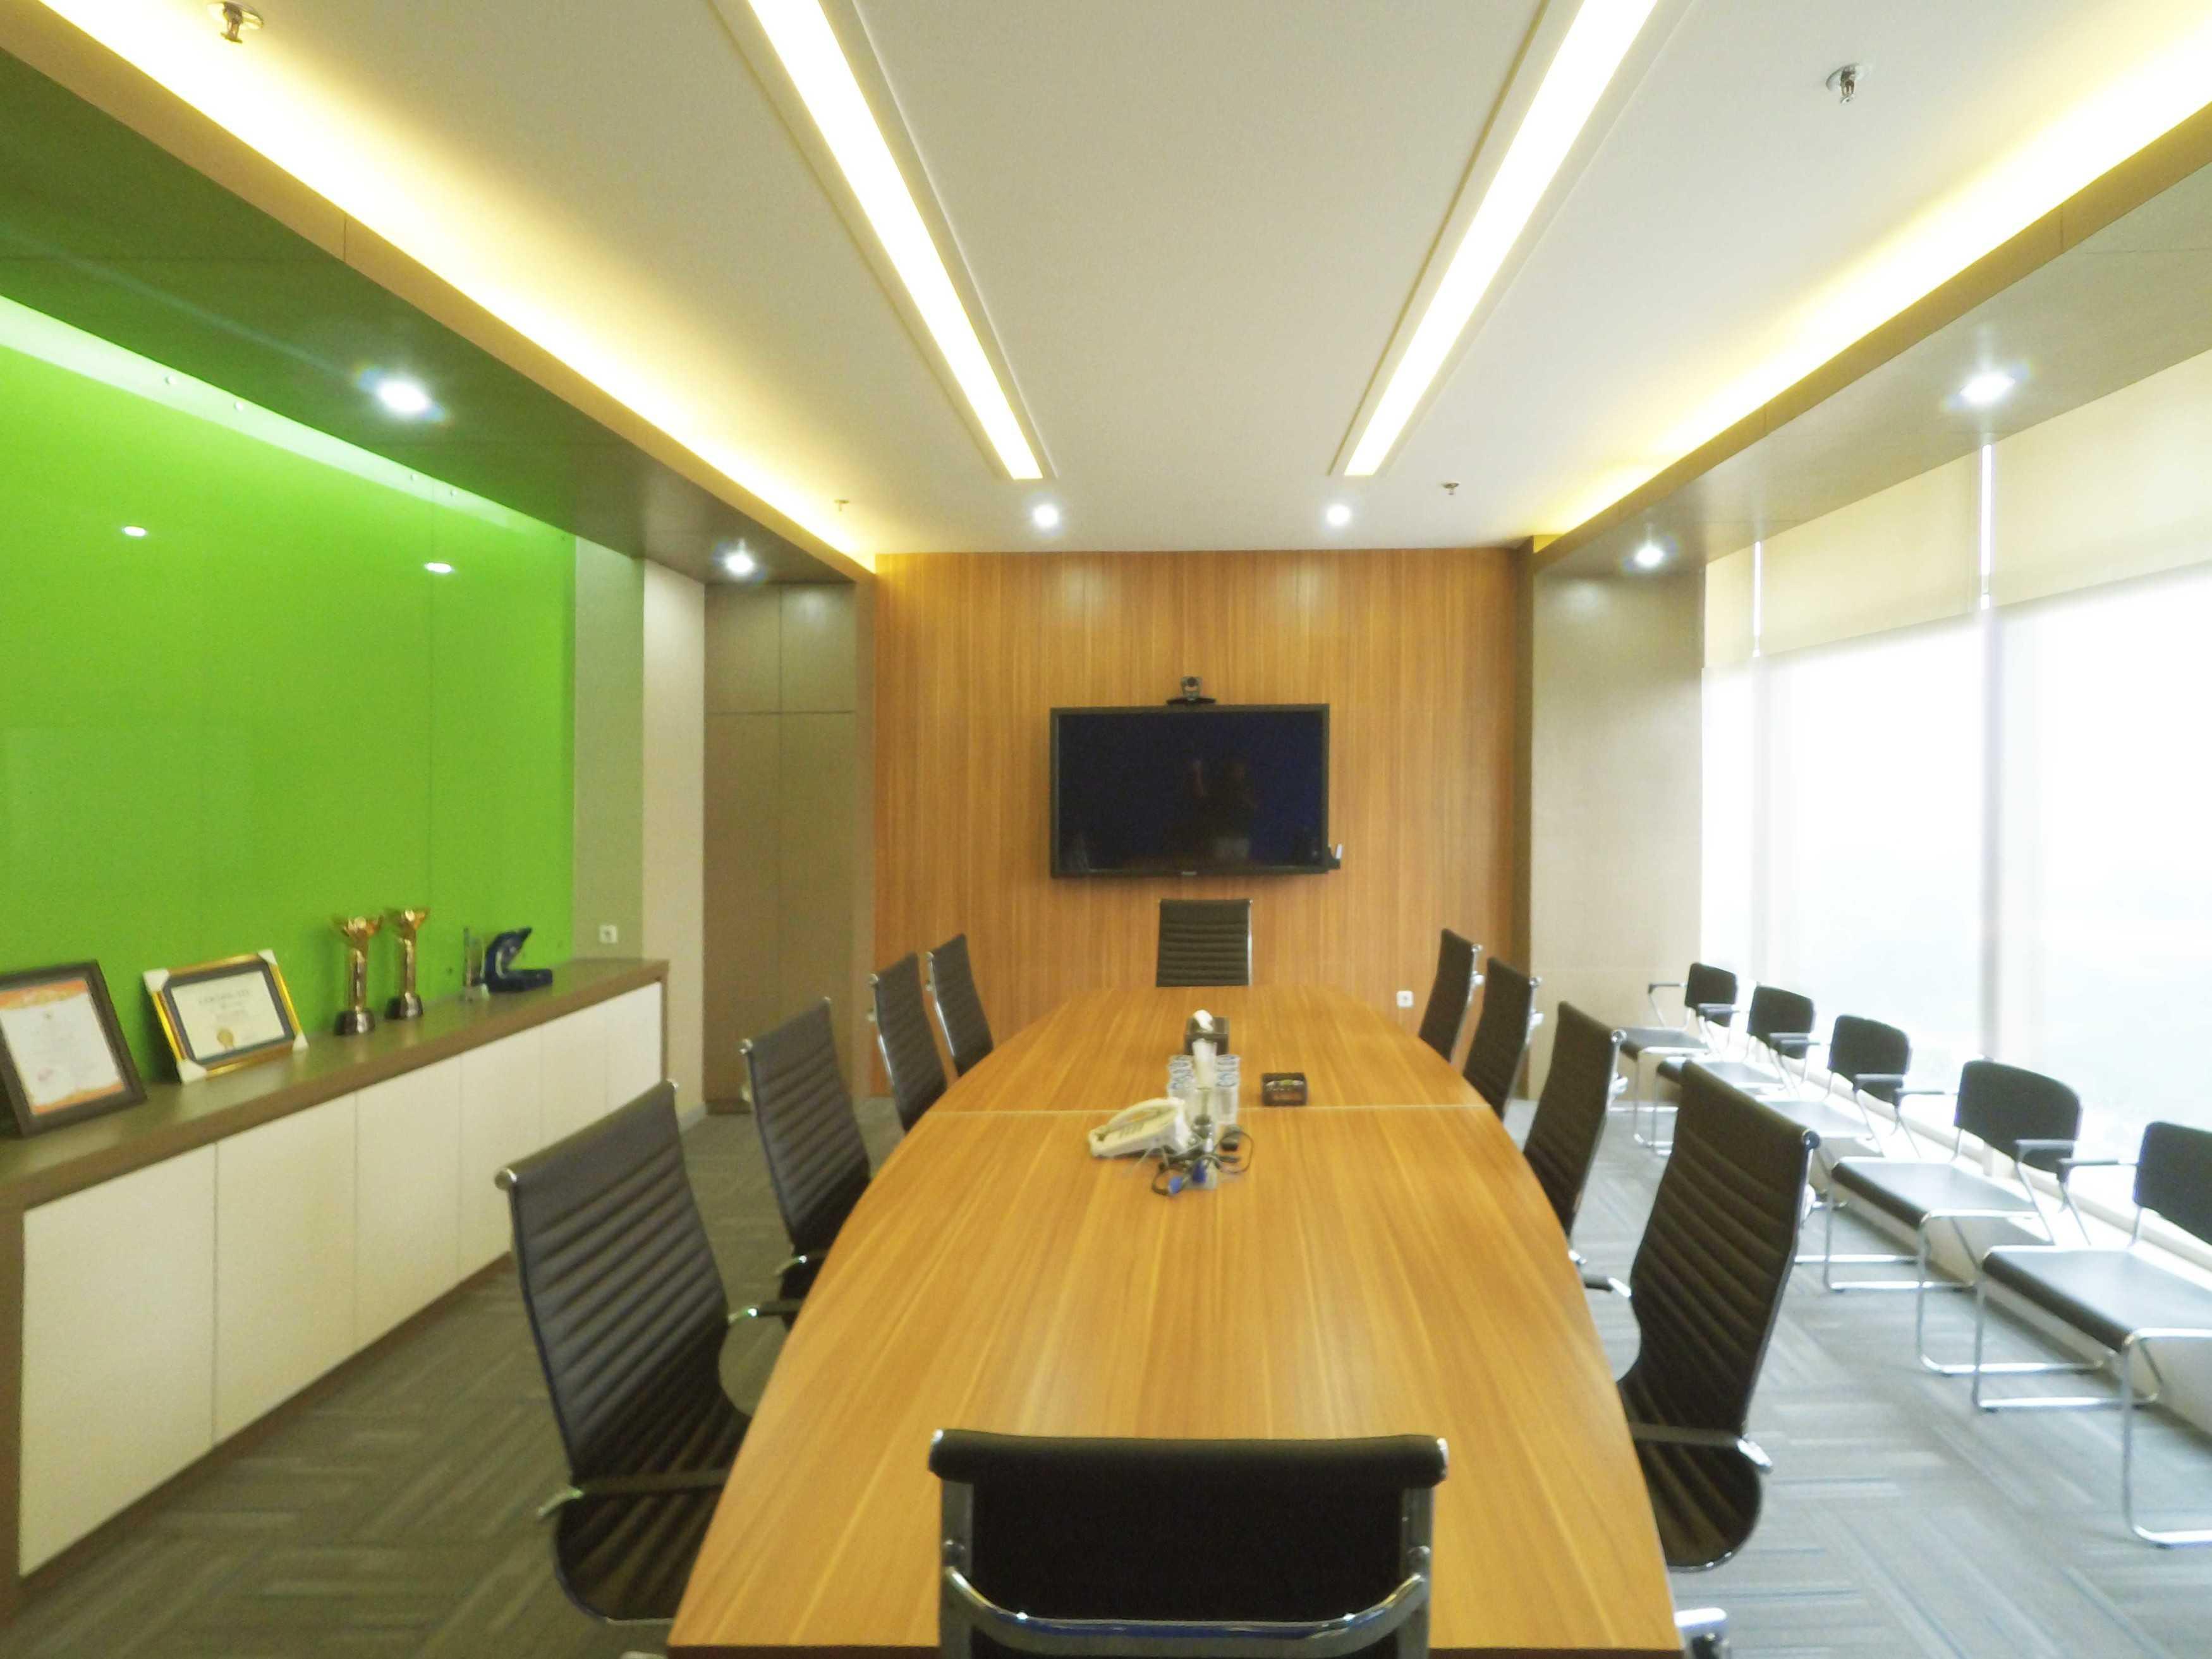 Arkadia Works Sekar Bumi Office Renovation Plaza Asia 21St Floor Plaza Asia 21St Floor Meeting Room   14073